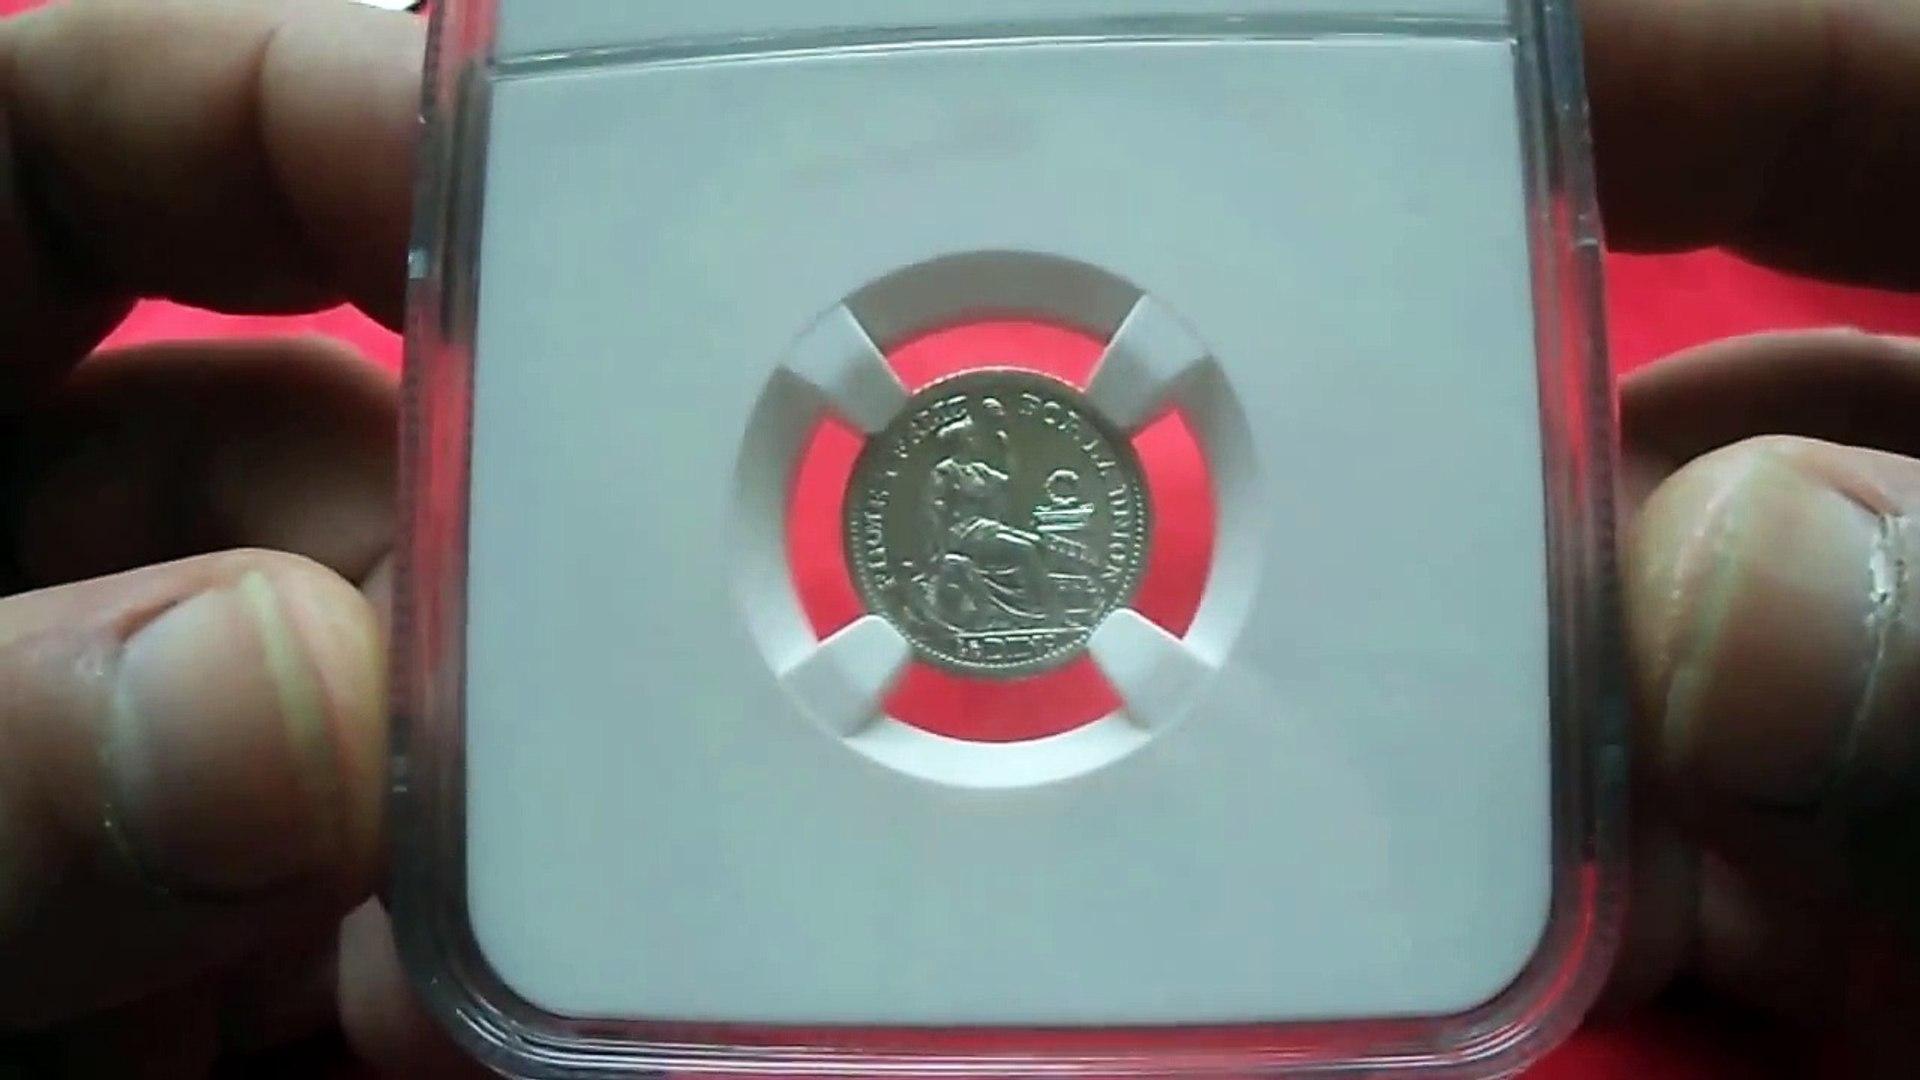 Baby :) PERU 1/2 DINERO 1916 MS - 65 (Перу 1916 1/2 Динейро MS - 65 Серебро)